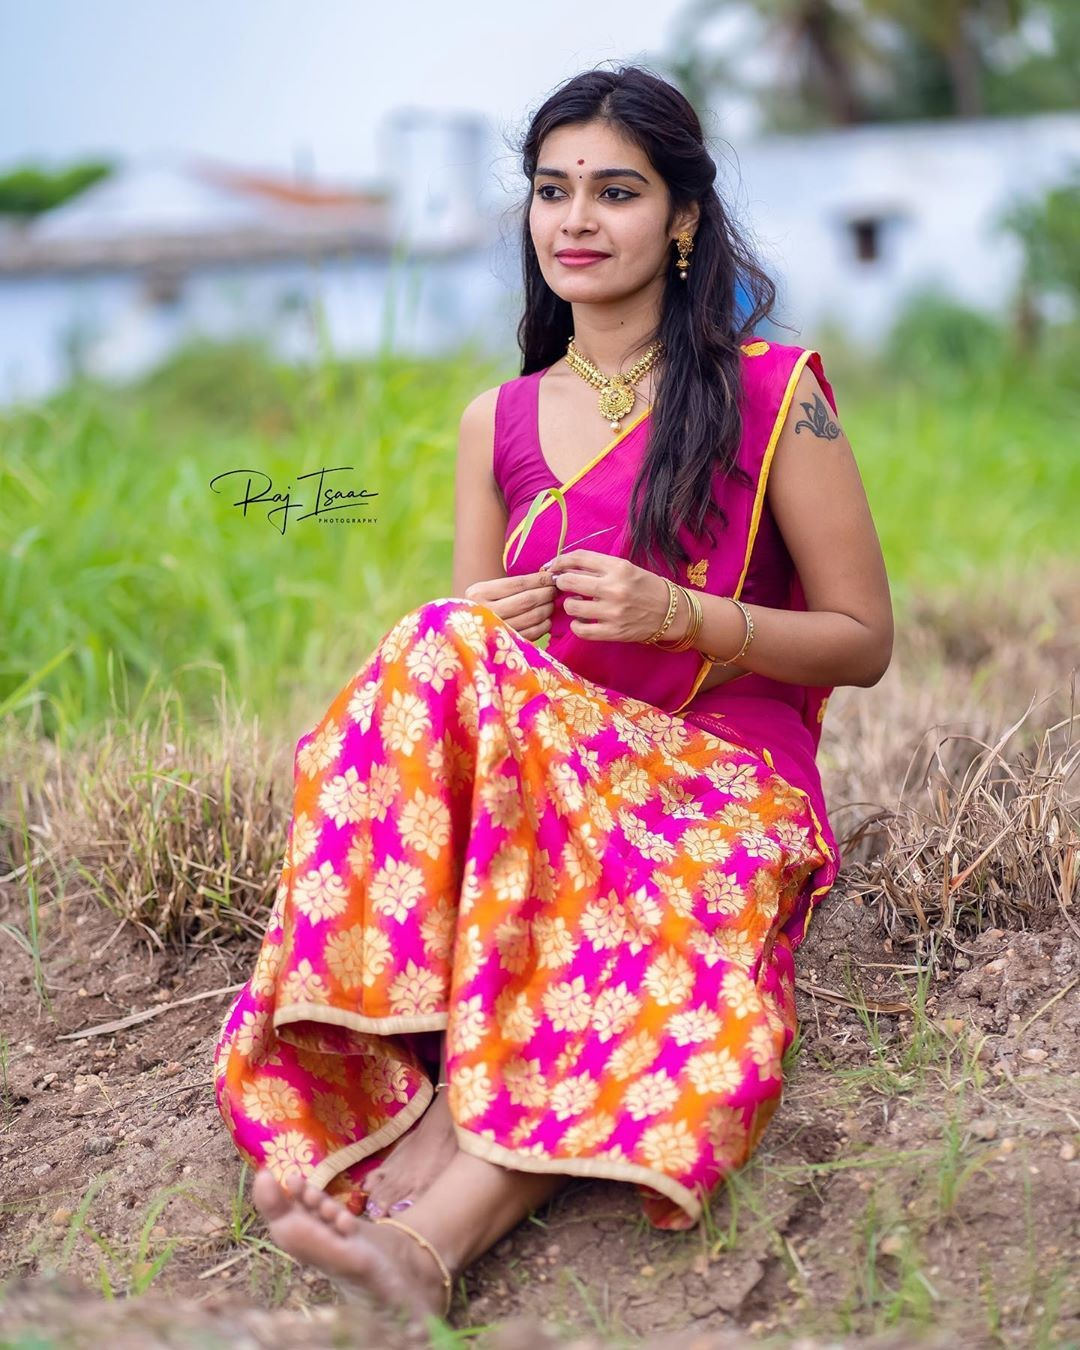 dharsha gupta hd images